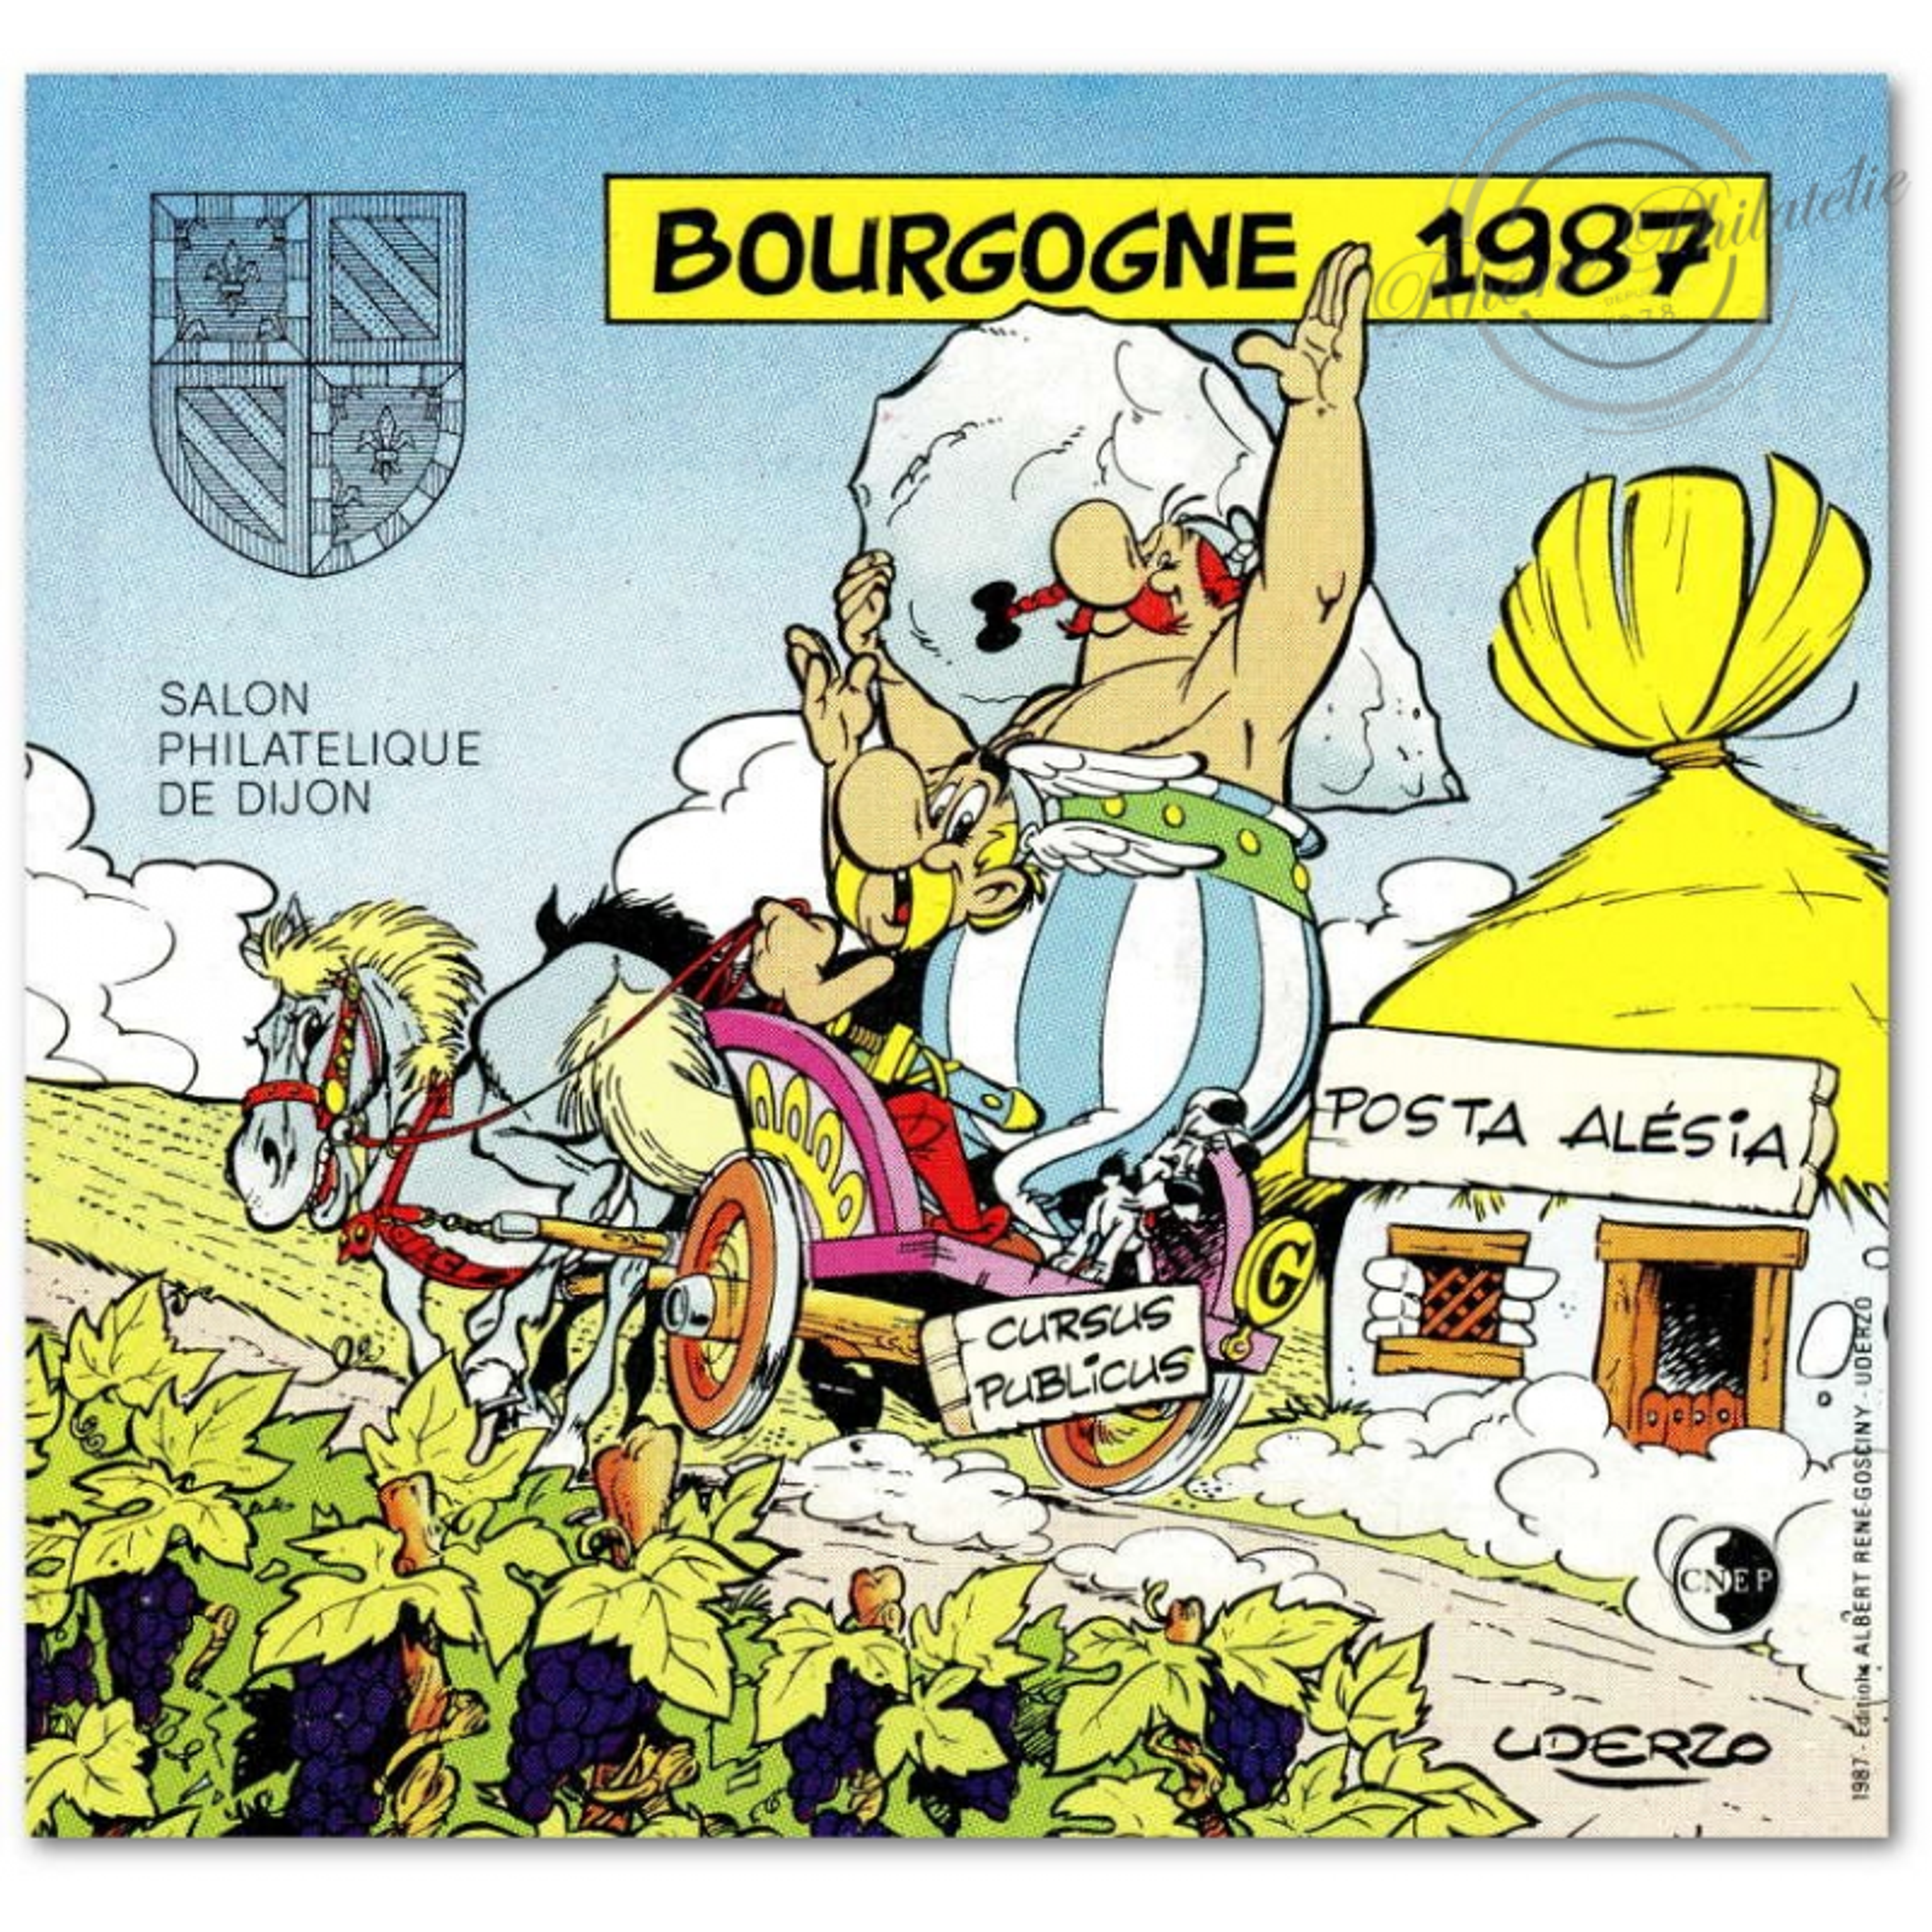 "BLOC CNEP NON DENTELE N°8a ""BOURGOGNE 1987"""